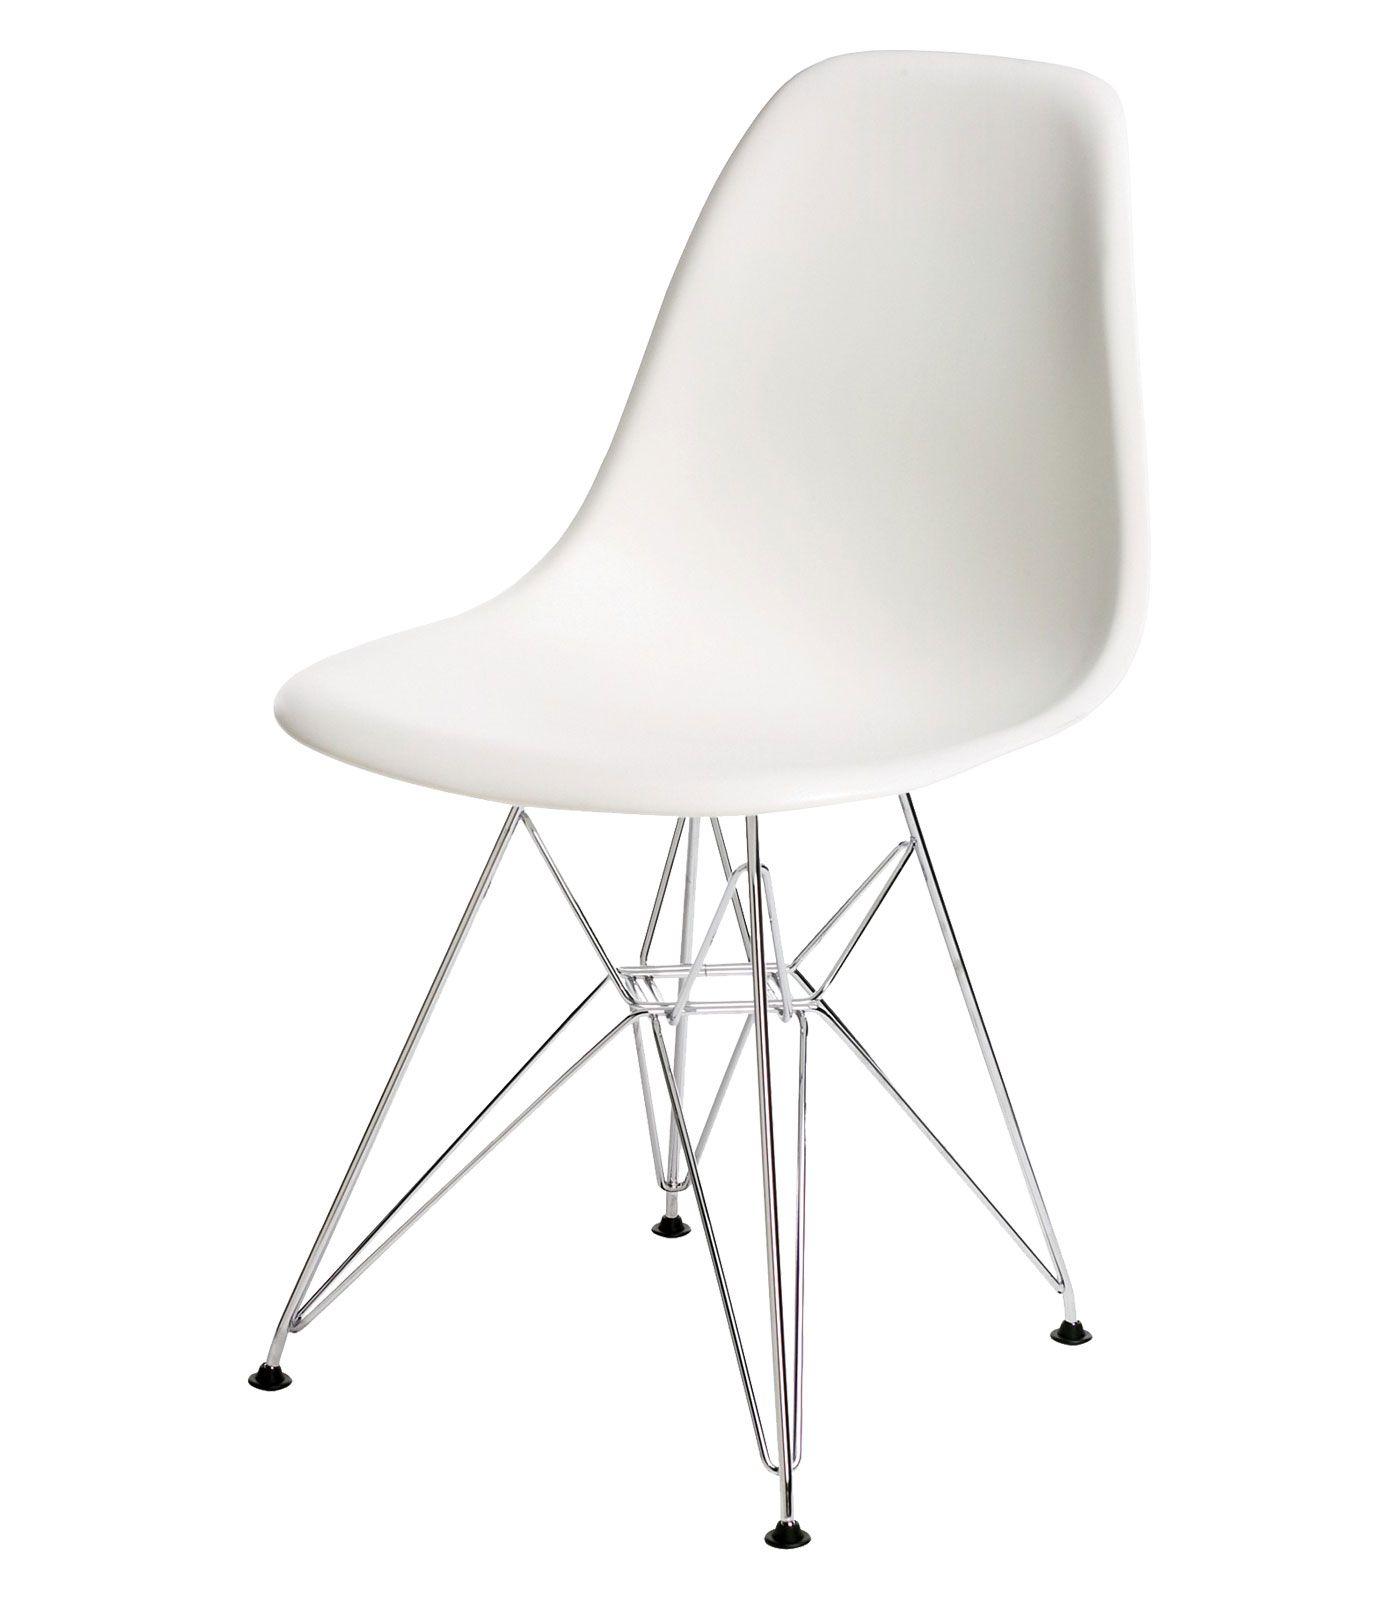 Vitra eames dsr plastic side chair muebles pinterest for Vitra replica shop